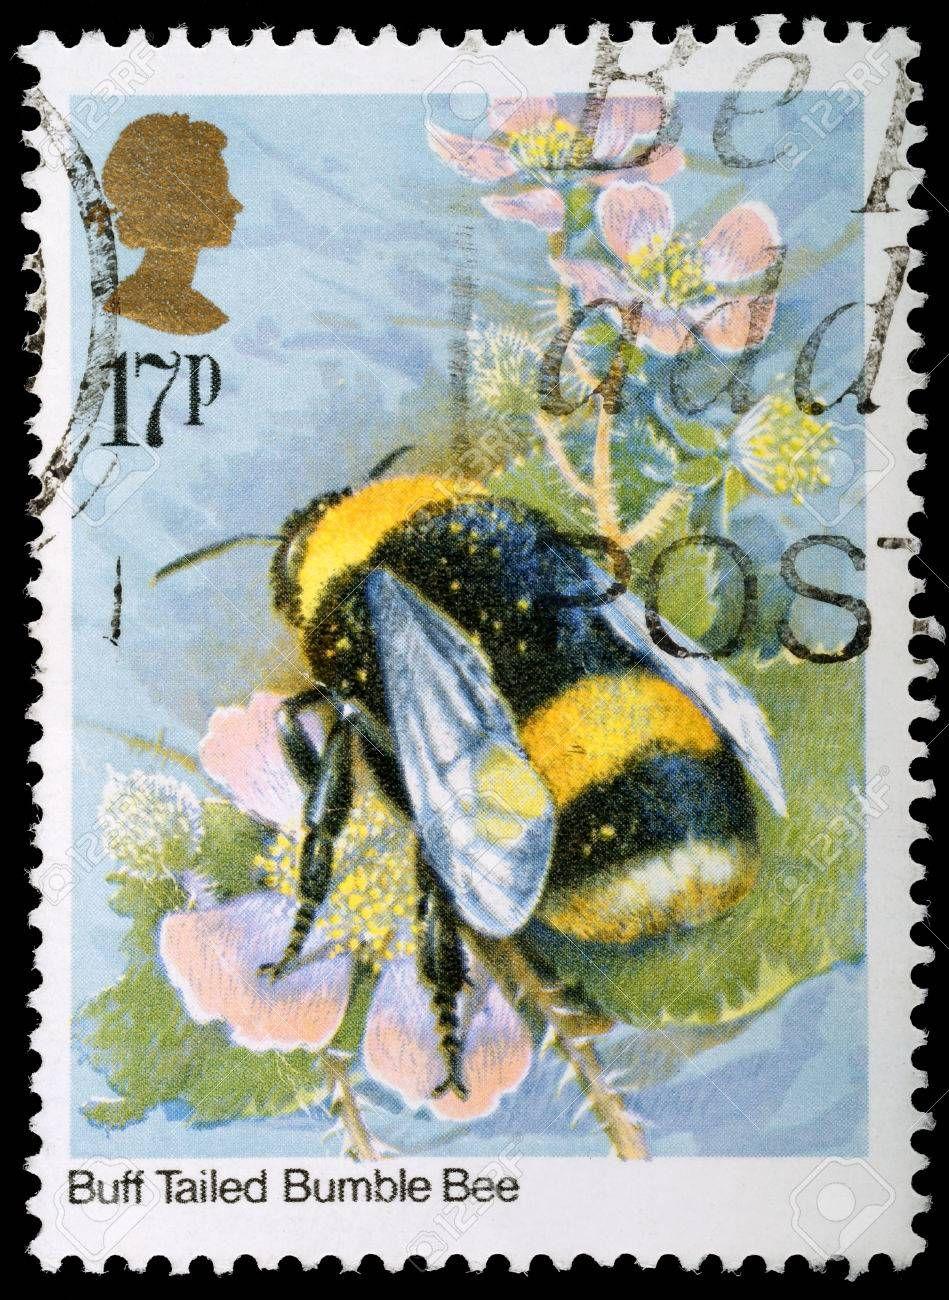 United Kingdom Circa 1985 A British Used Postage Stamp Showing